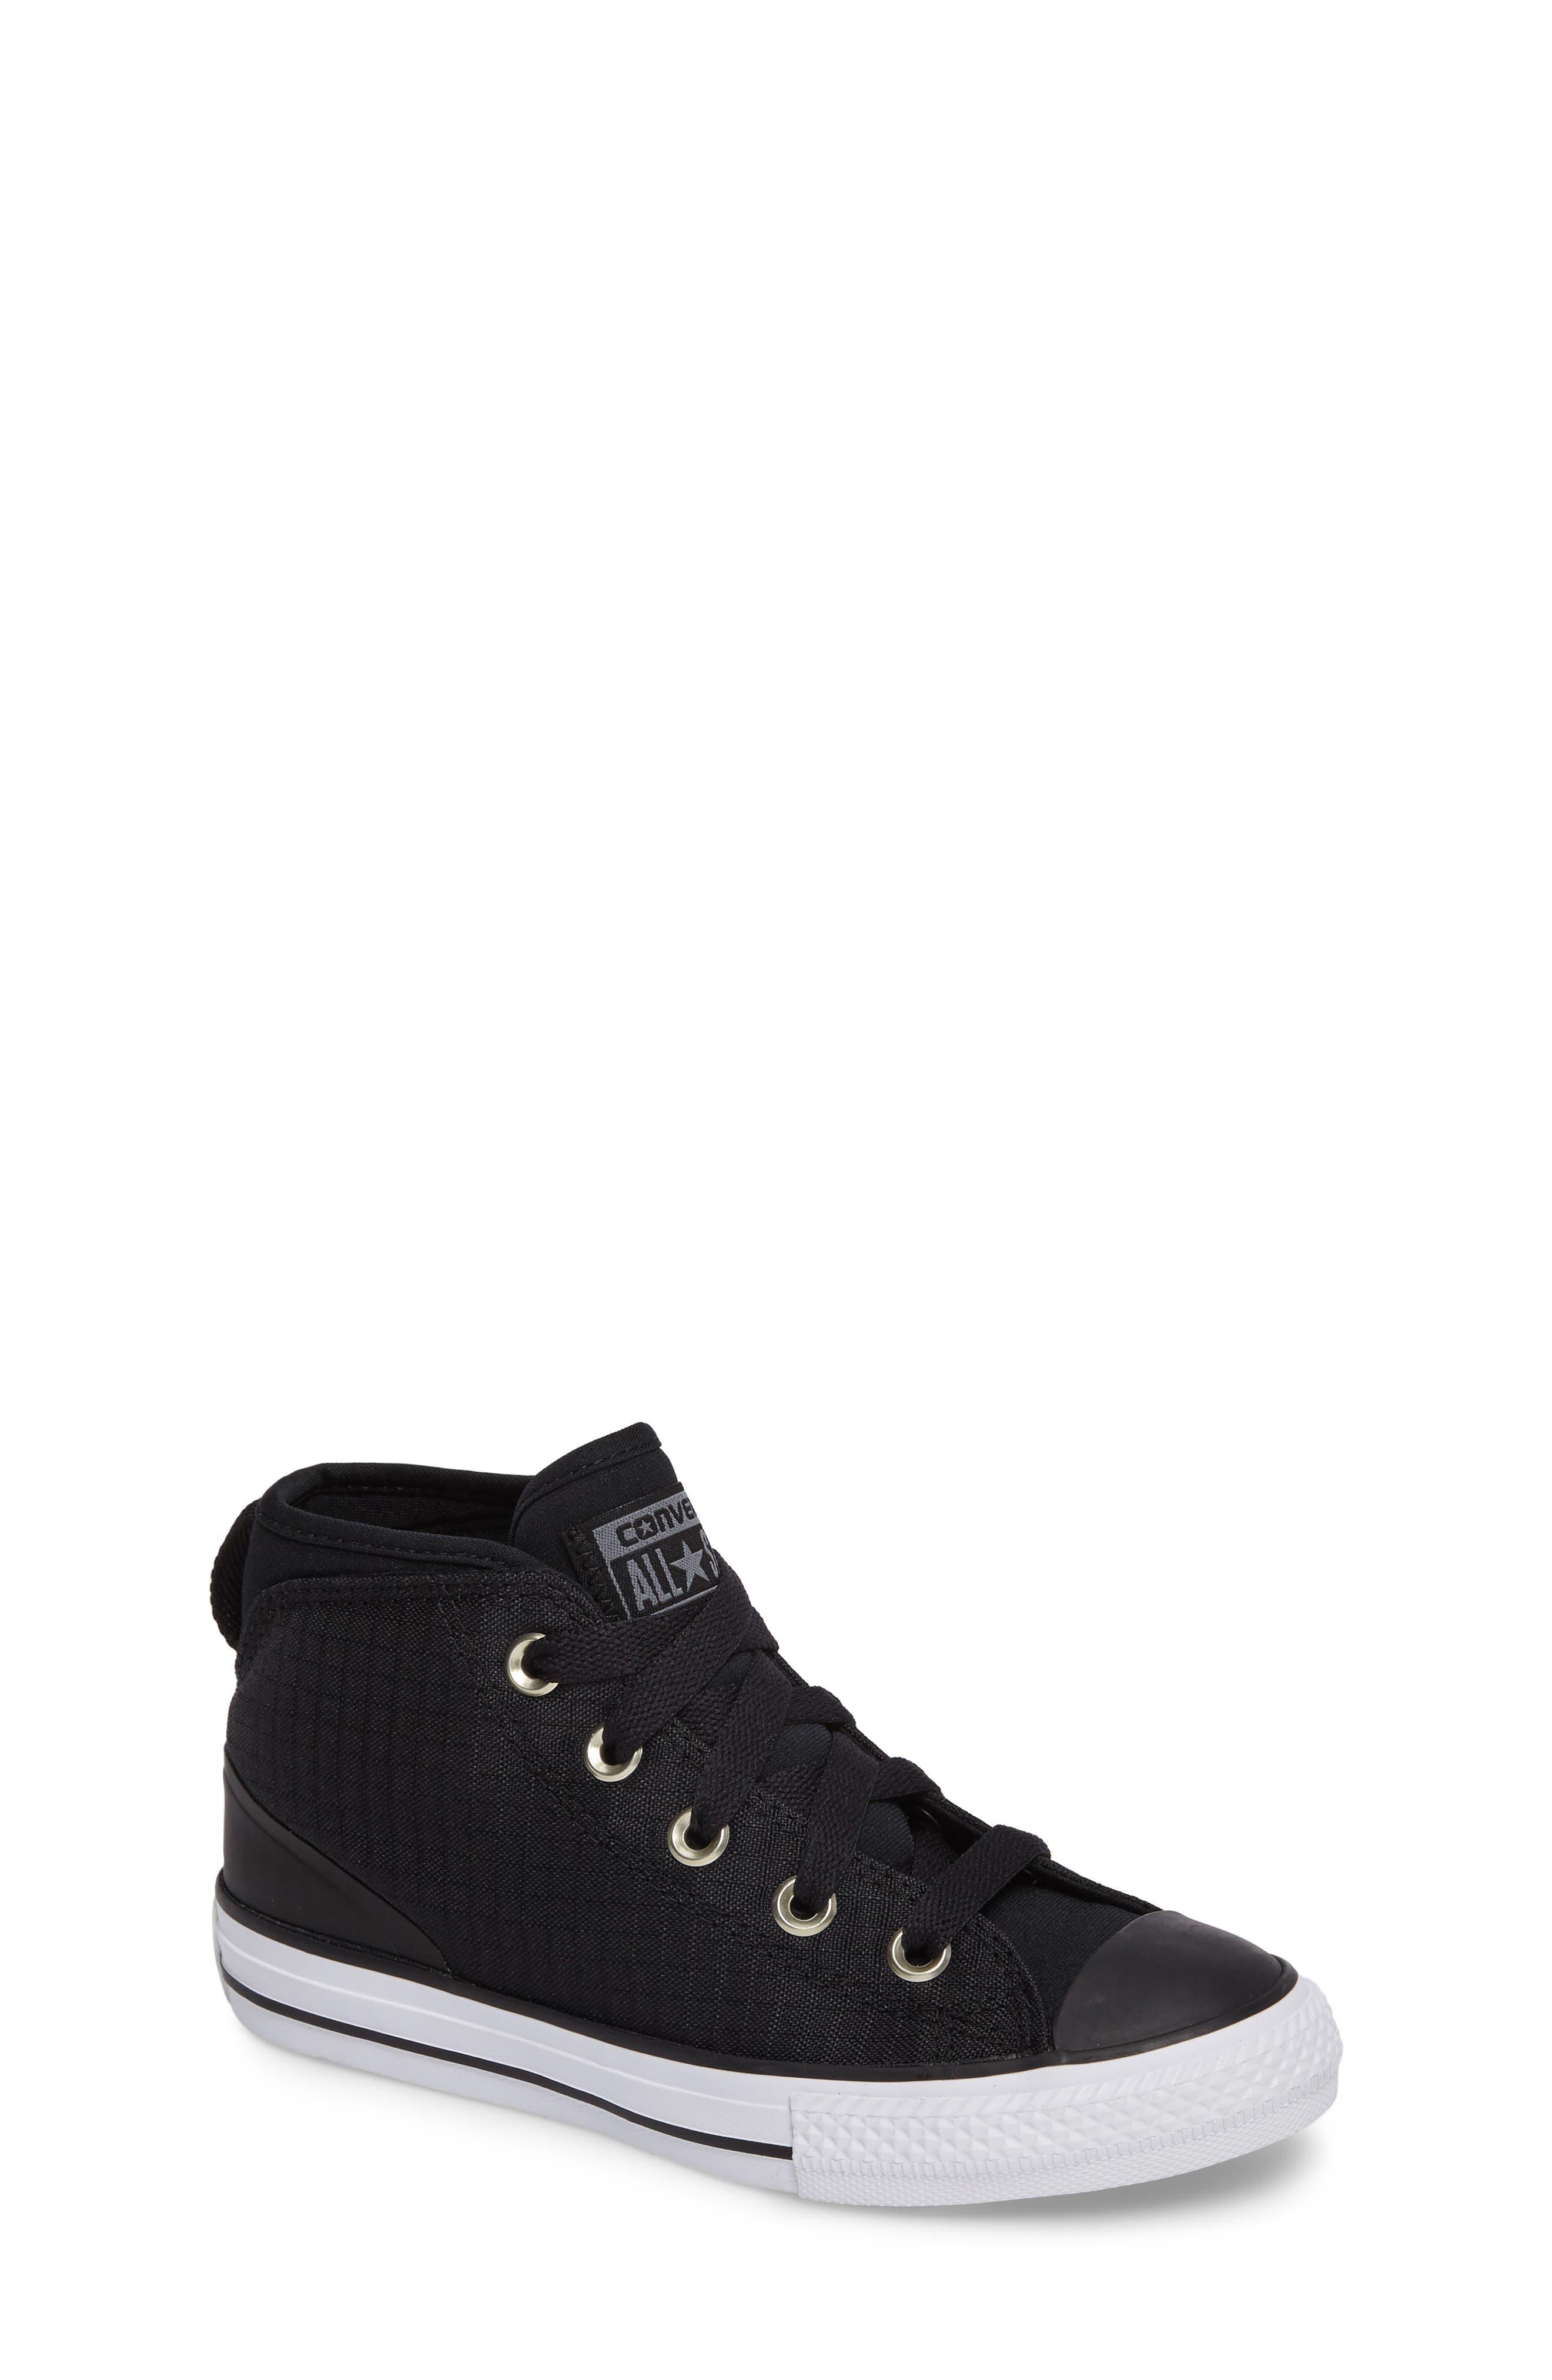 Converse Chuck Taylor® All Star® Syde Street High Top Sneaker (Toddler, Little Kid & Big Kid)